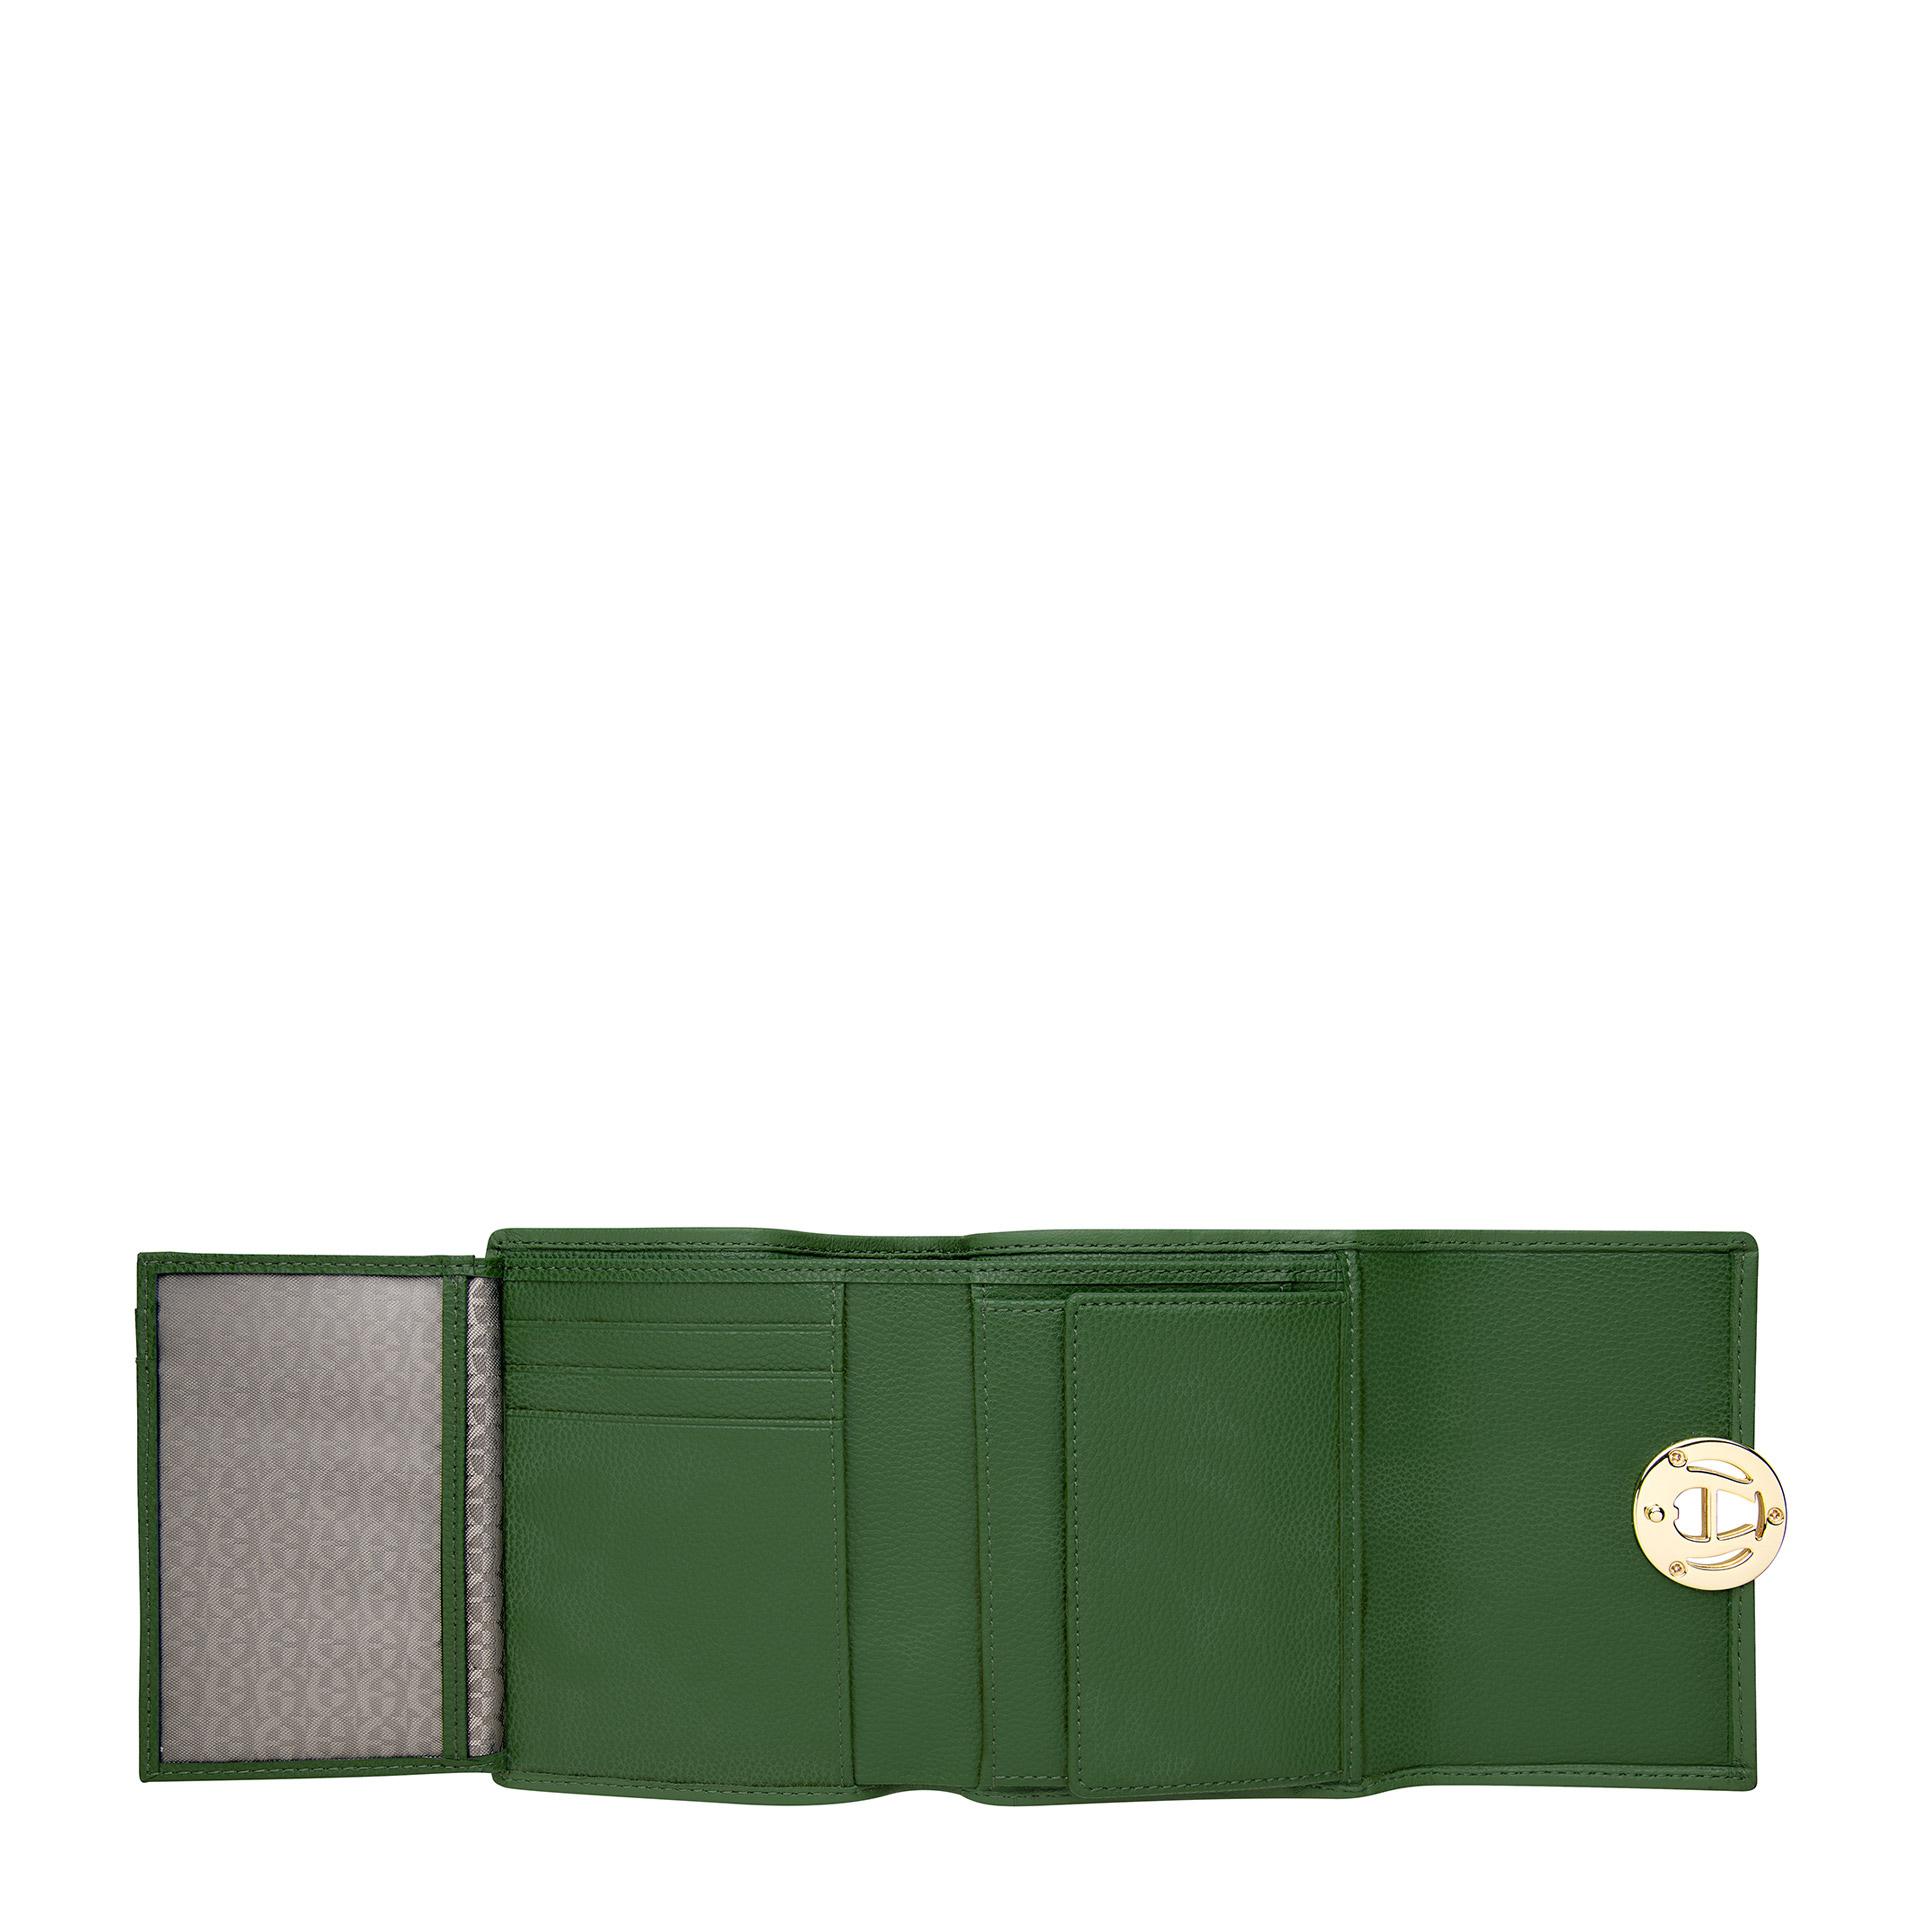 Aigner Livia Geldbörse matcha green